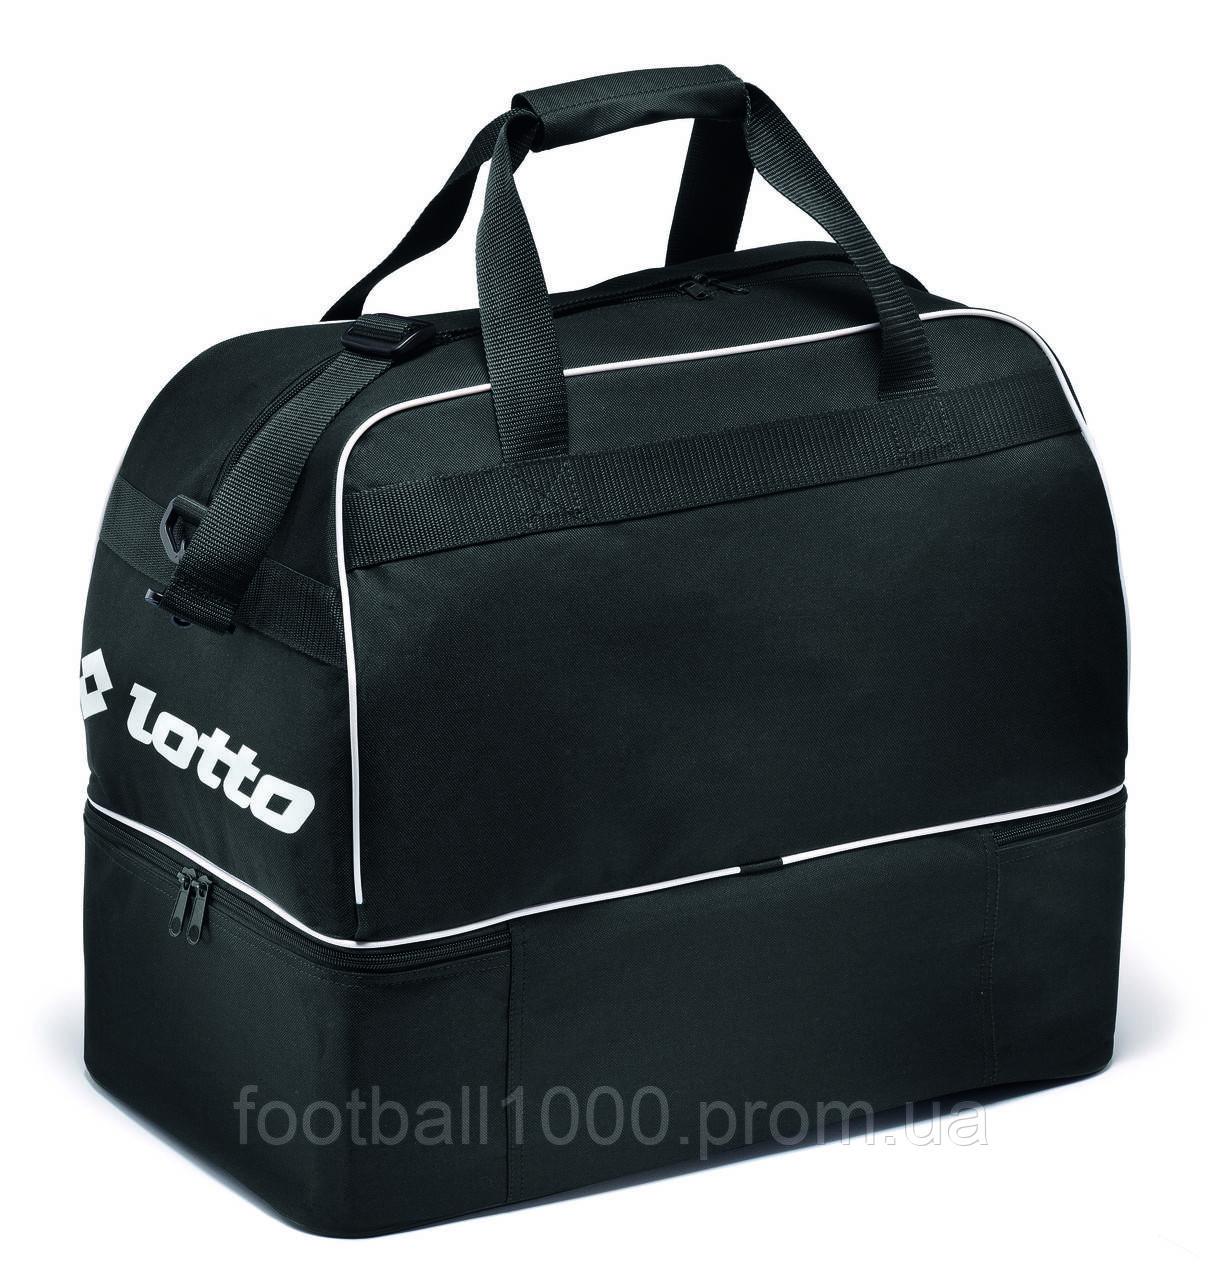 f5ee2cc2 Детская спортивная сумка Lotto Bag Soccer Omega, цена 782 грн., купить Київ  — Prom.ua (ID#253677845)